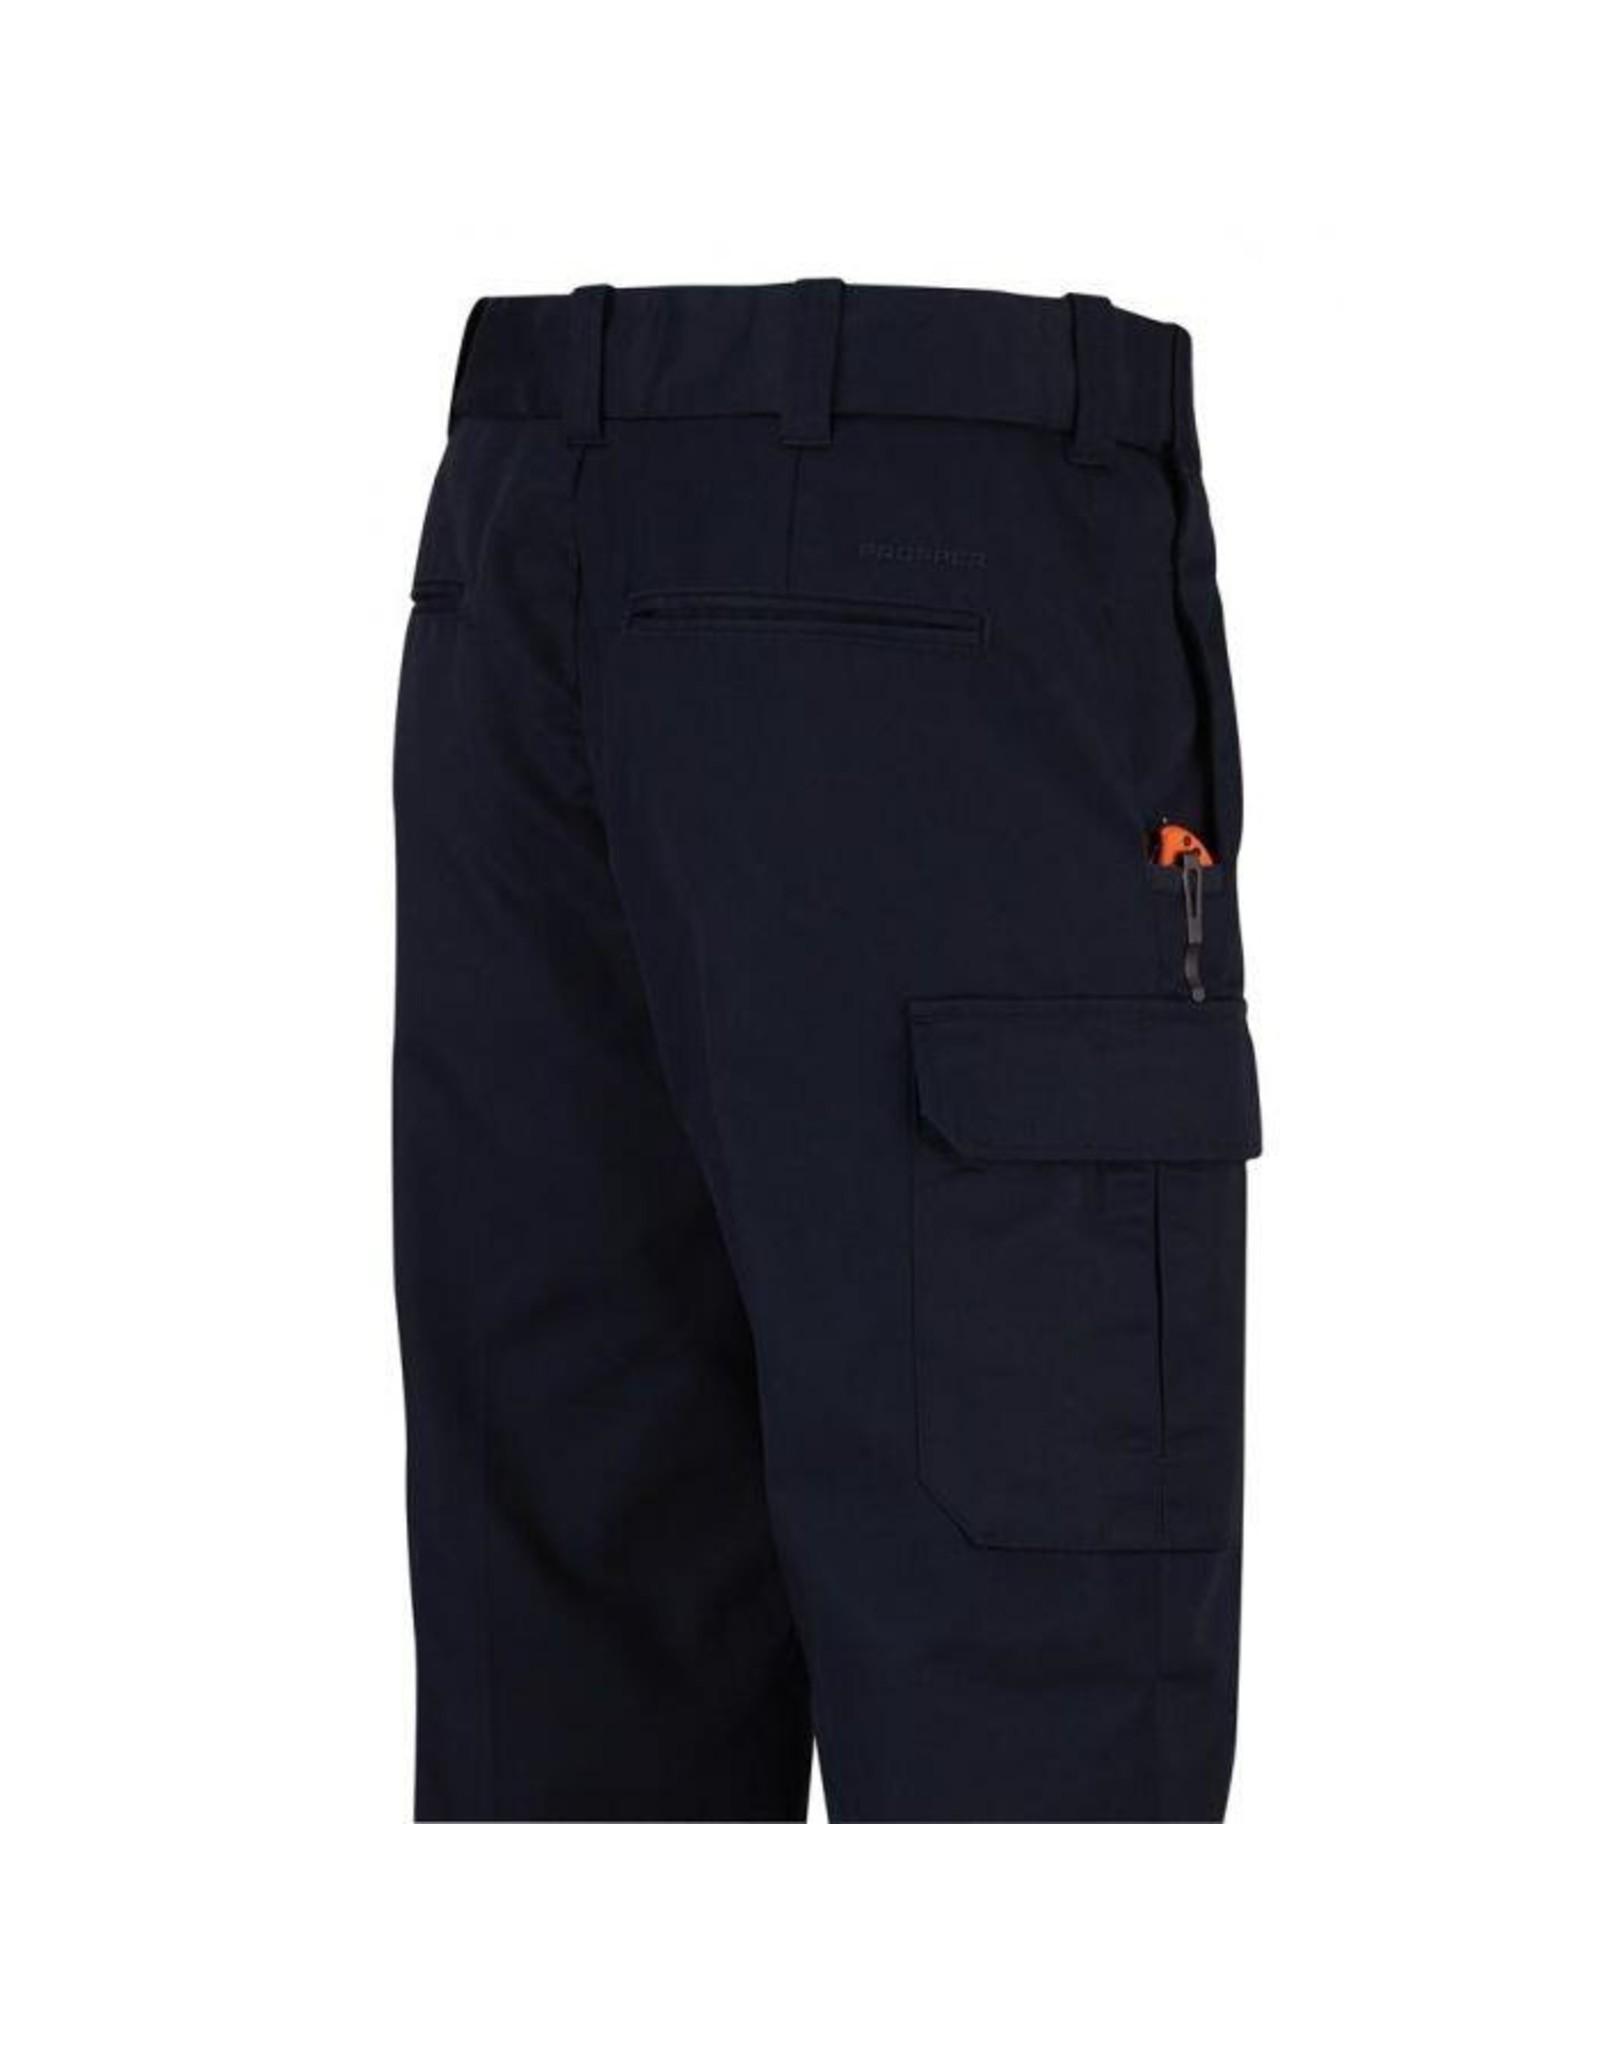 Propper Propper Mens Duty Cargo Pants Black (36X32)